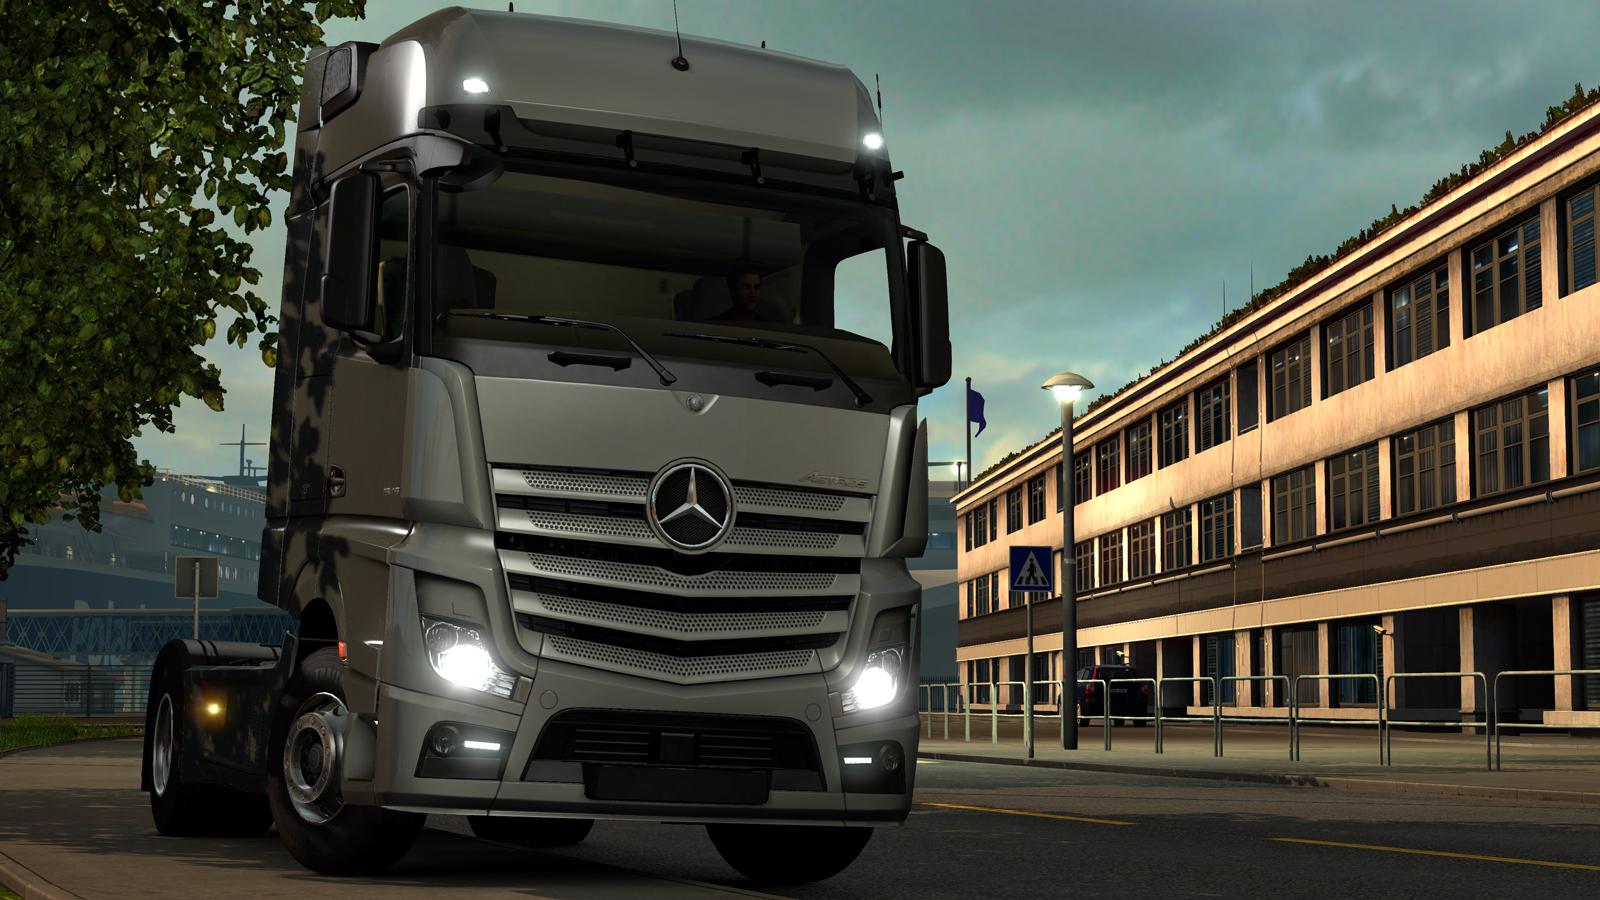 Euro Truck Simulator 2 wallpapers, Video Game, HQ Euro Truck